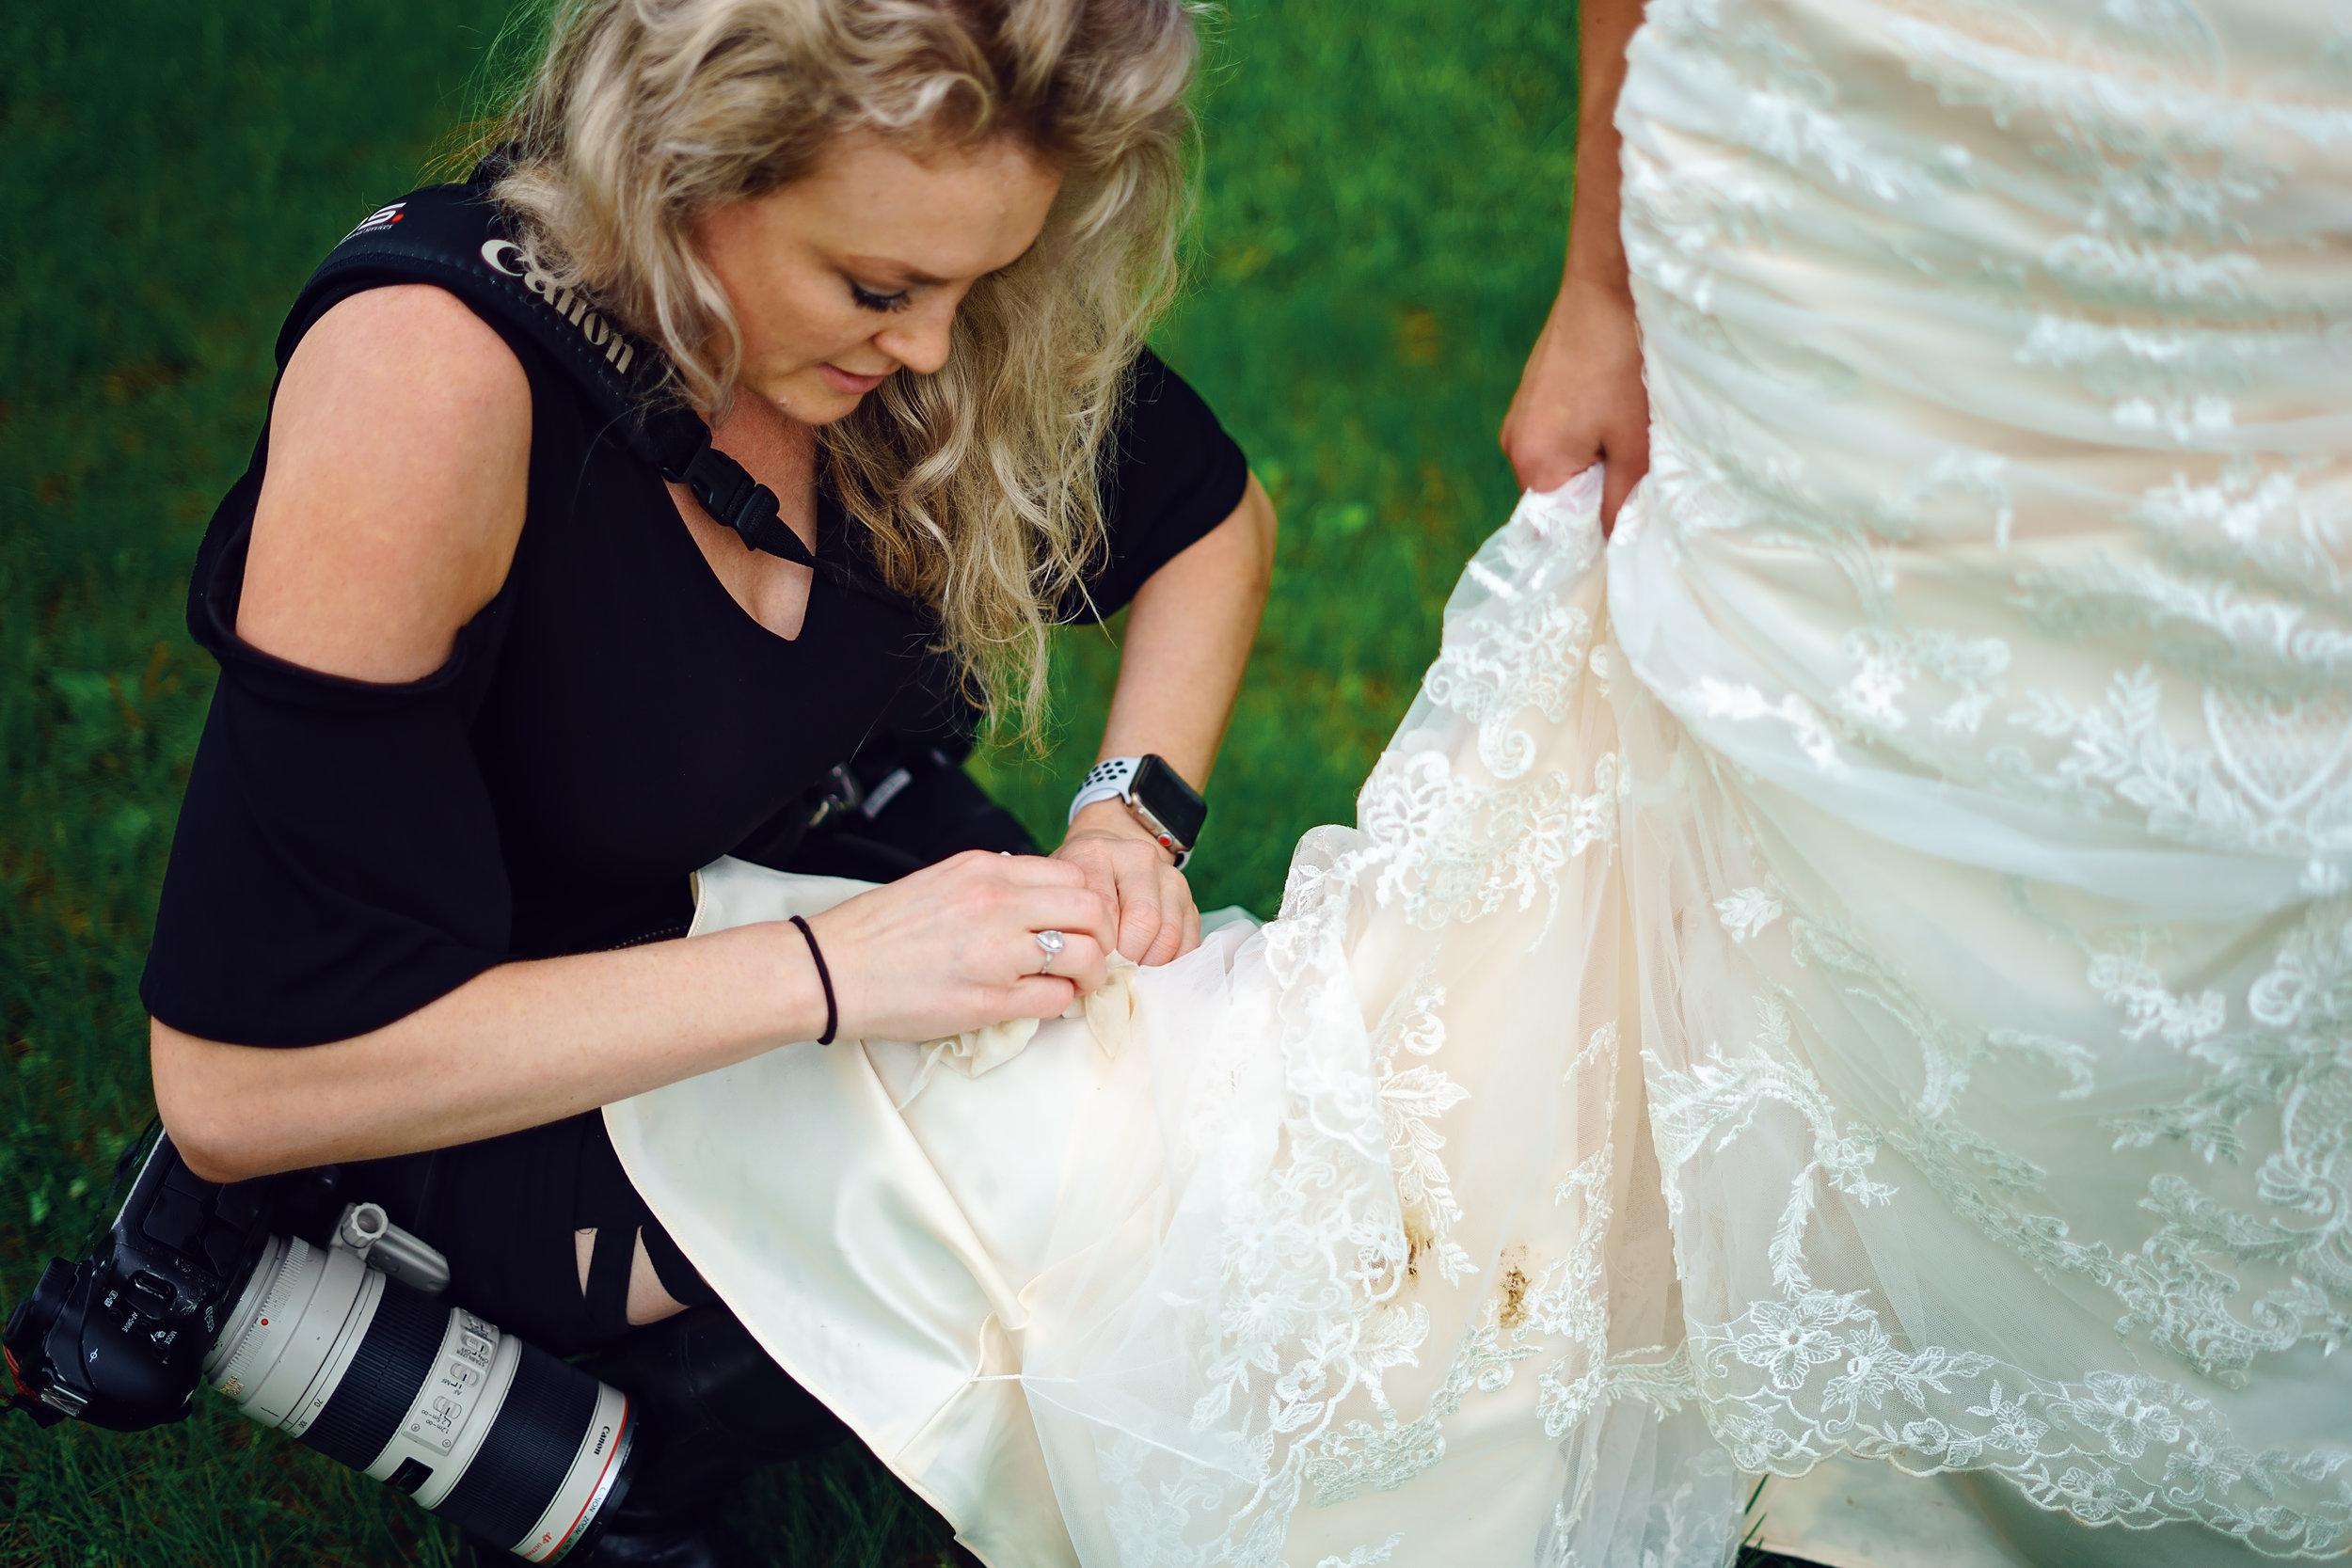 Lauren-ashley-studios-cleaning-wedding-dress.jpg